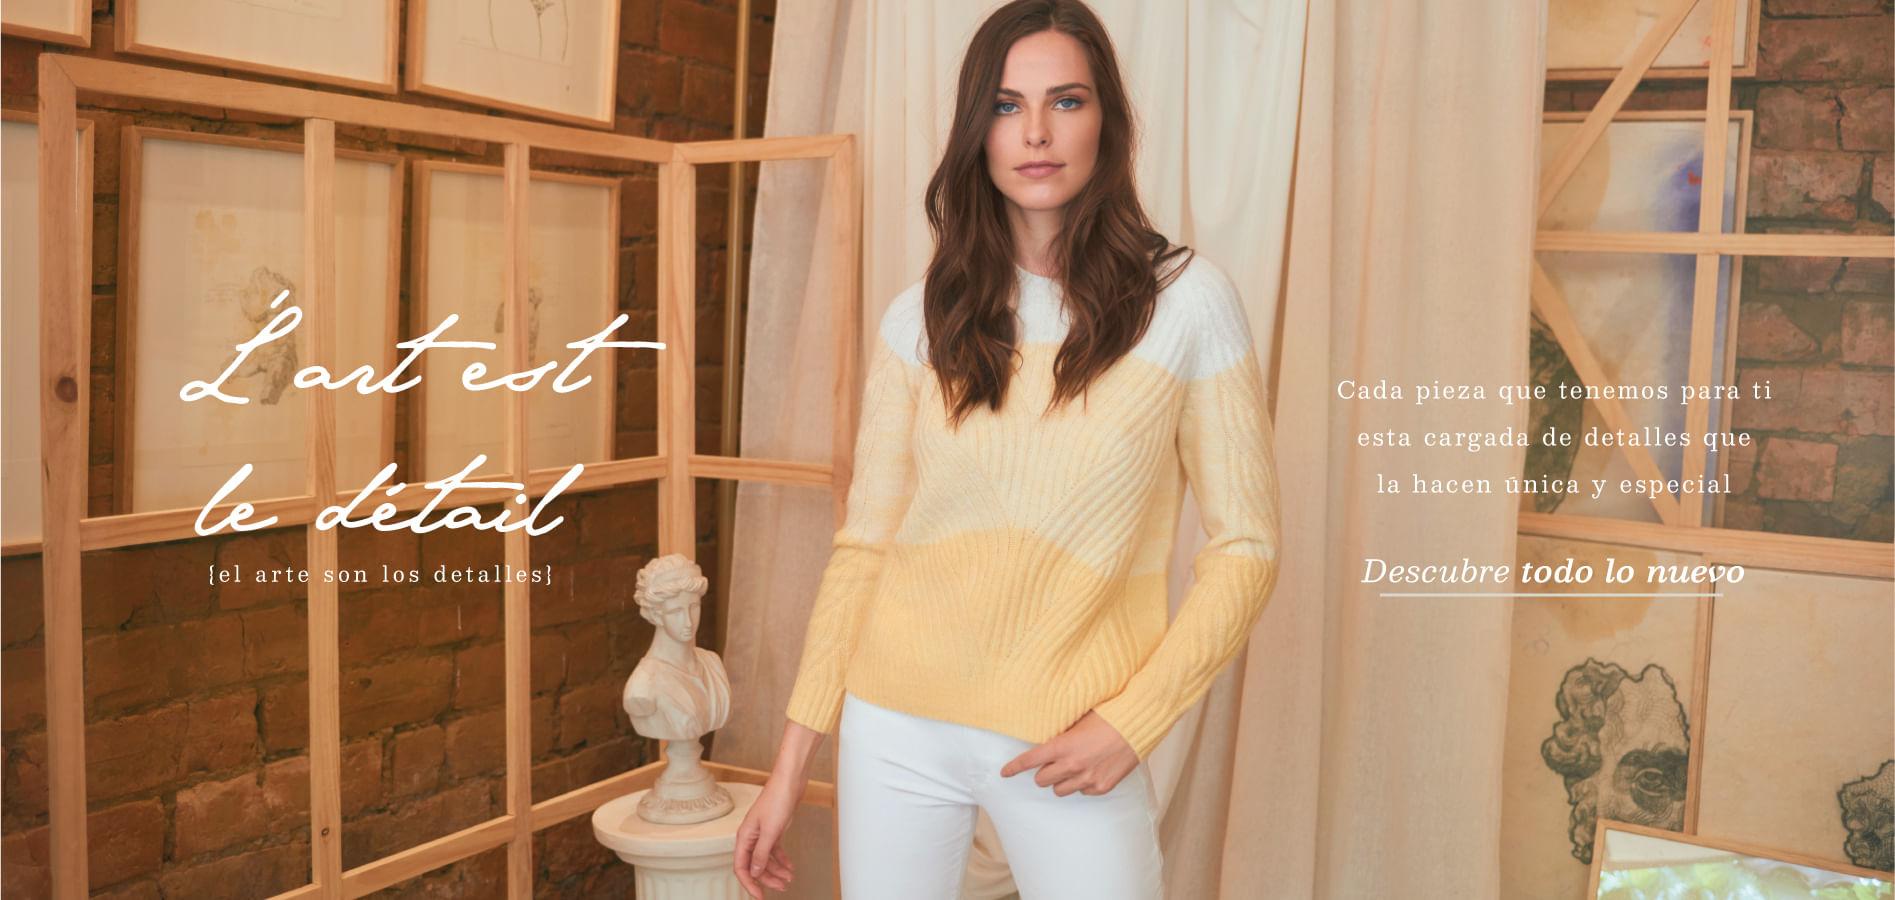 38669ab8d920 NAF NAF Tienda Online | Tendencias en Moda Femenina